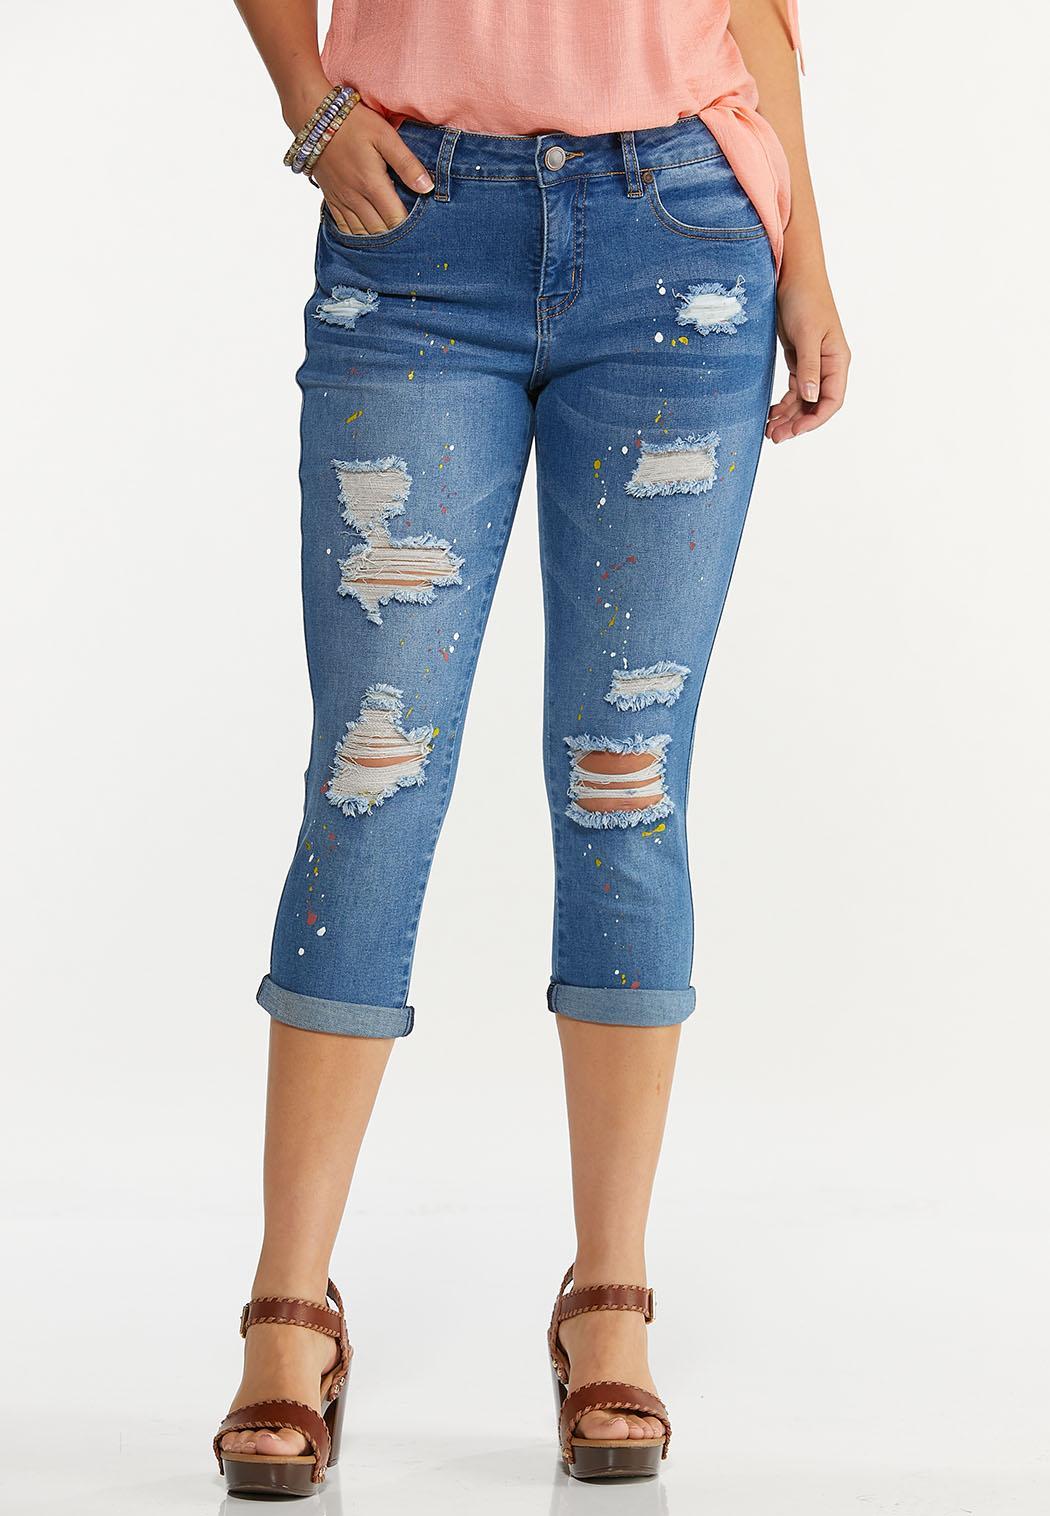 Cropped Paint Splatter Jeans